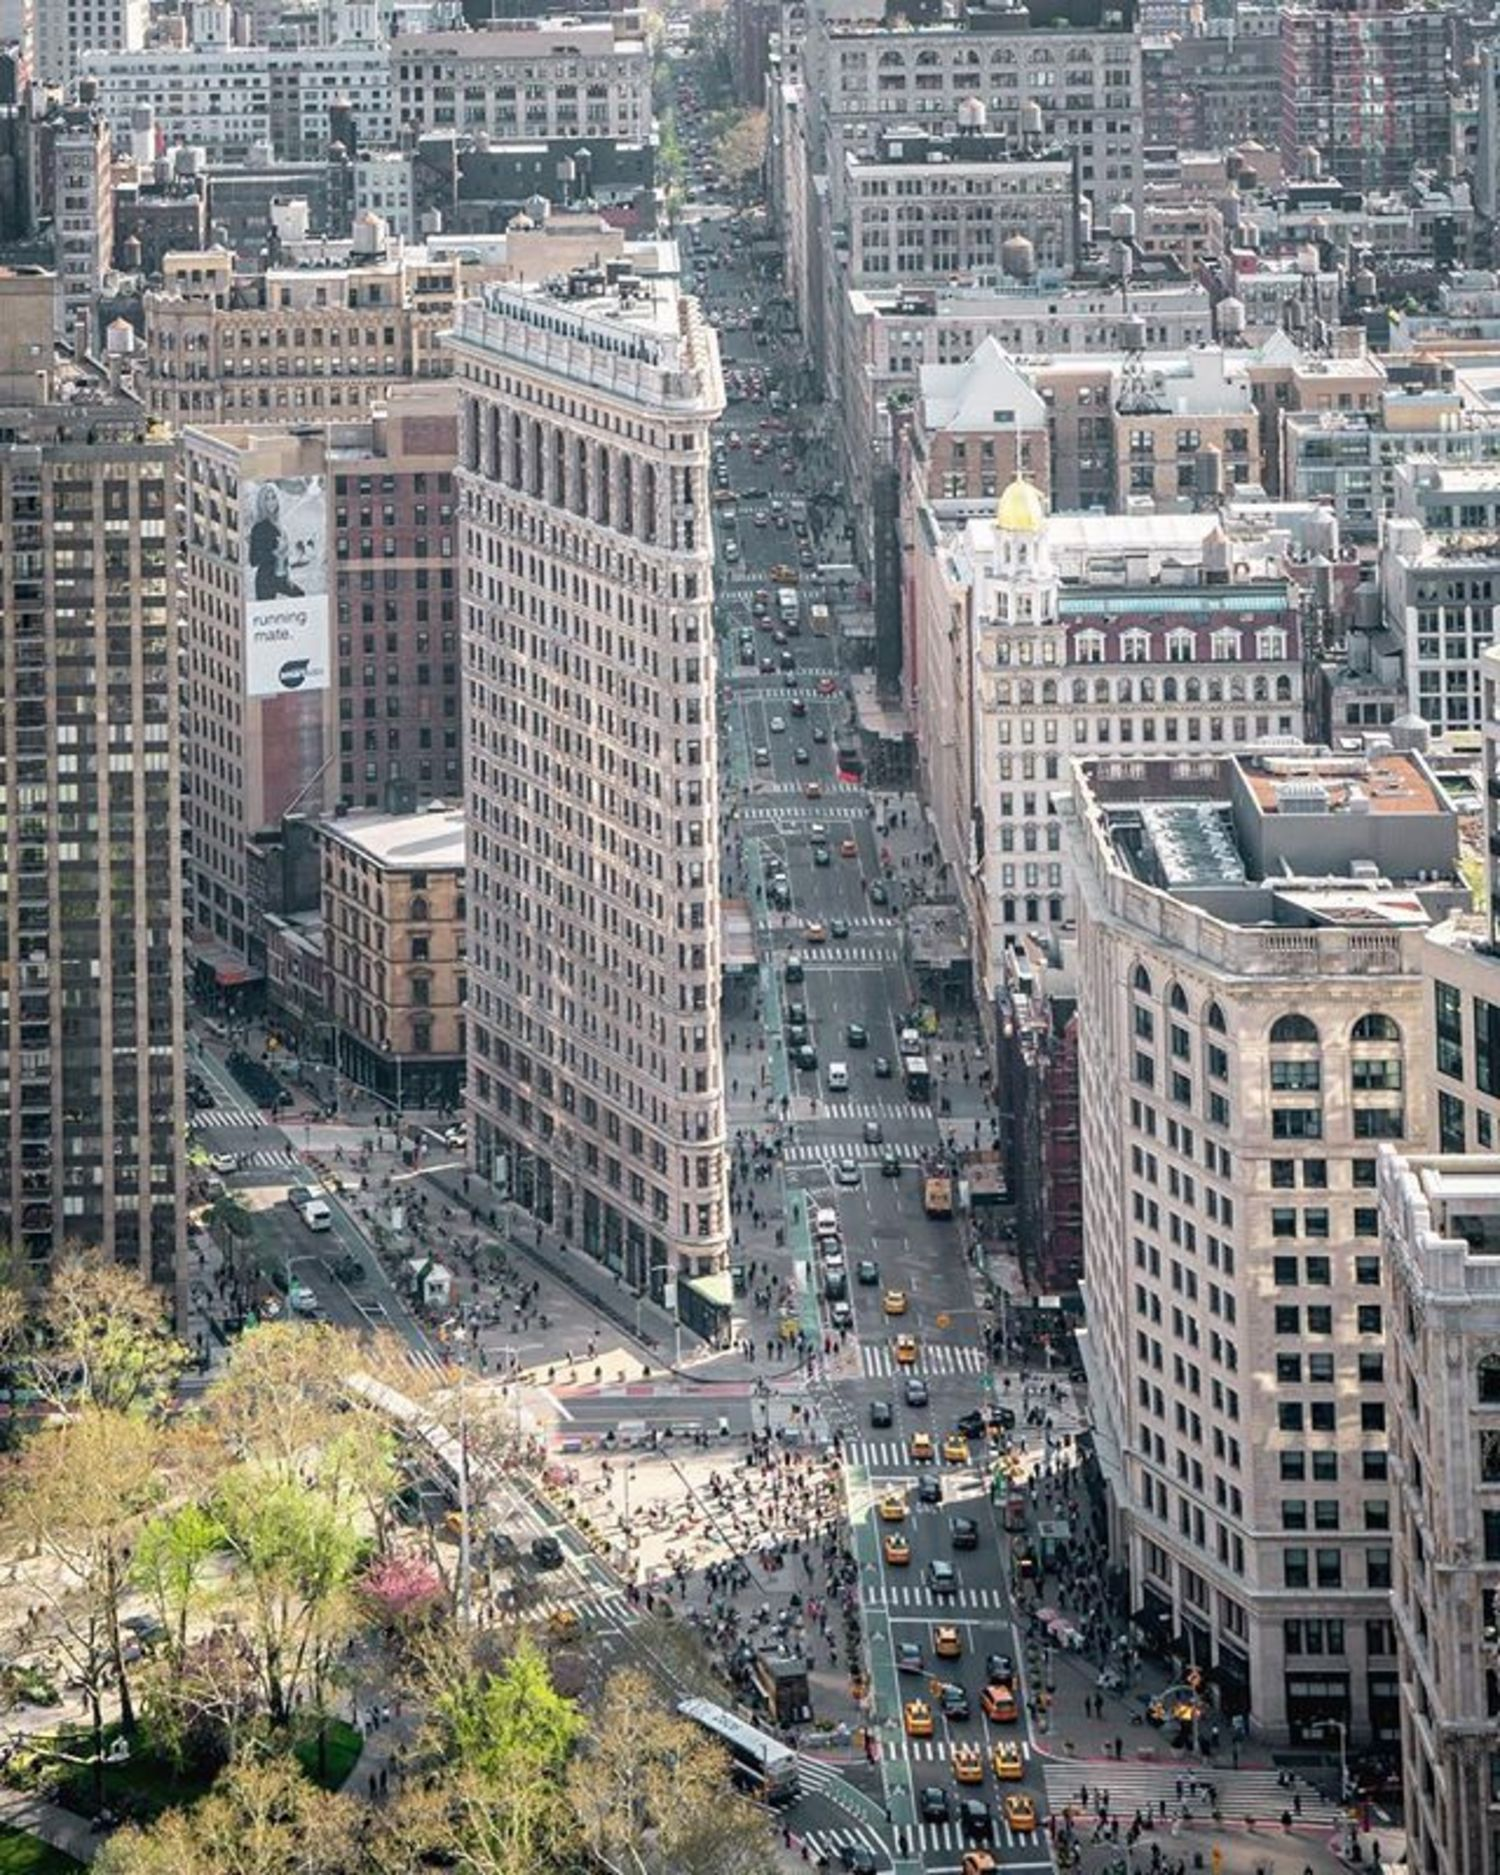 Flatiron Building, Manhattan, New York. Photo via @212sid #viewingnyc #newyork #newyorkcity #nyc #flatiron